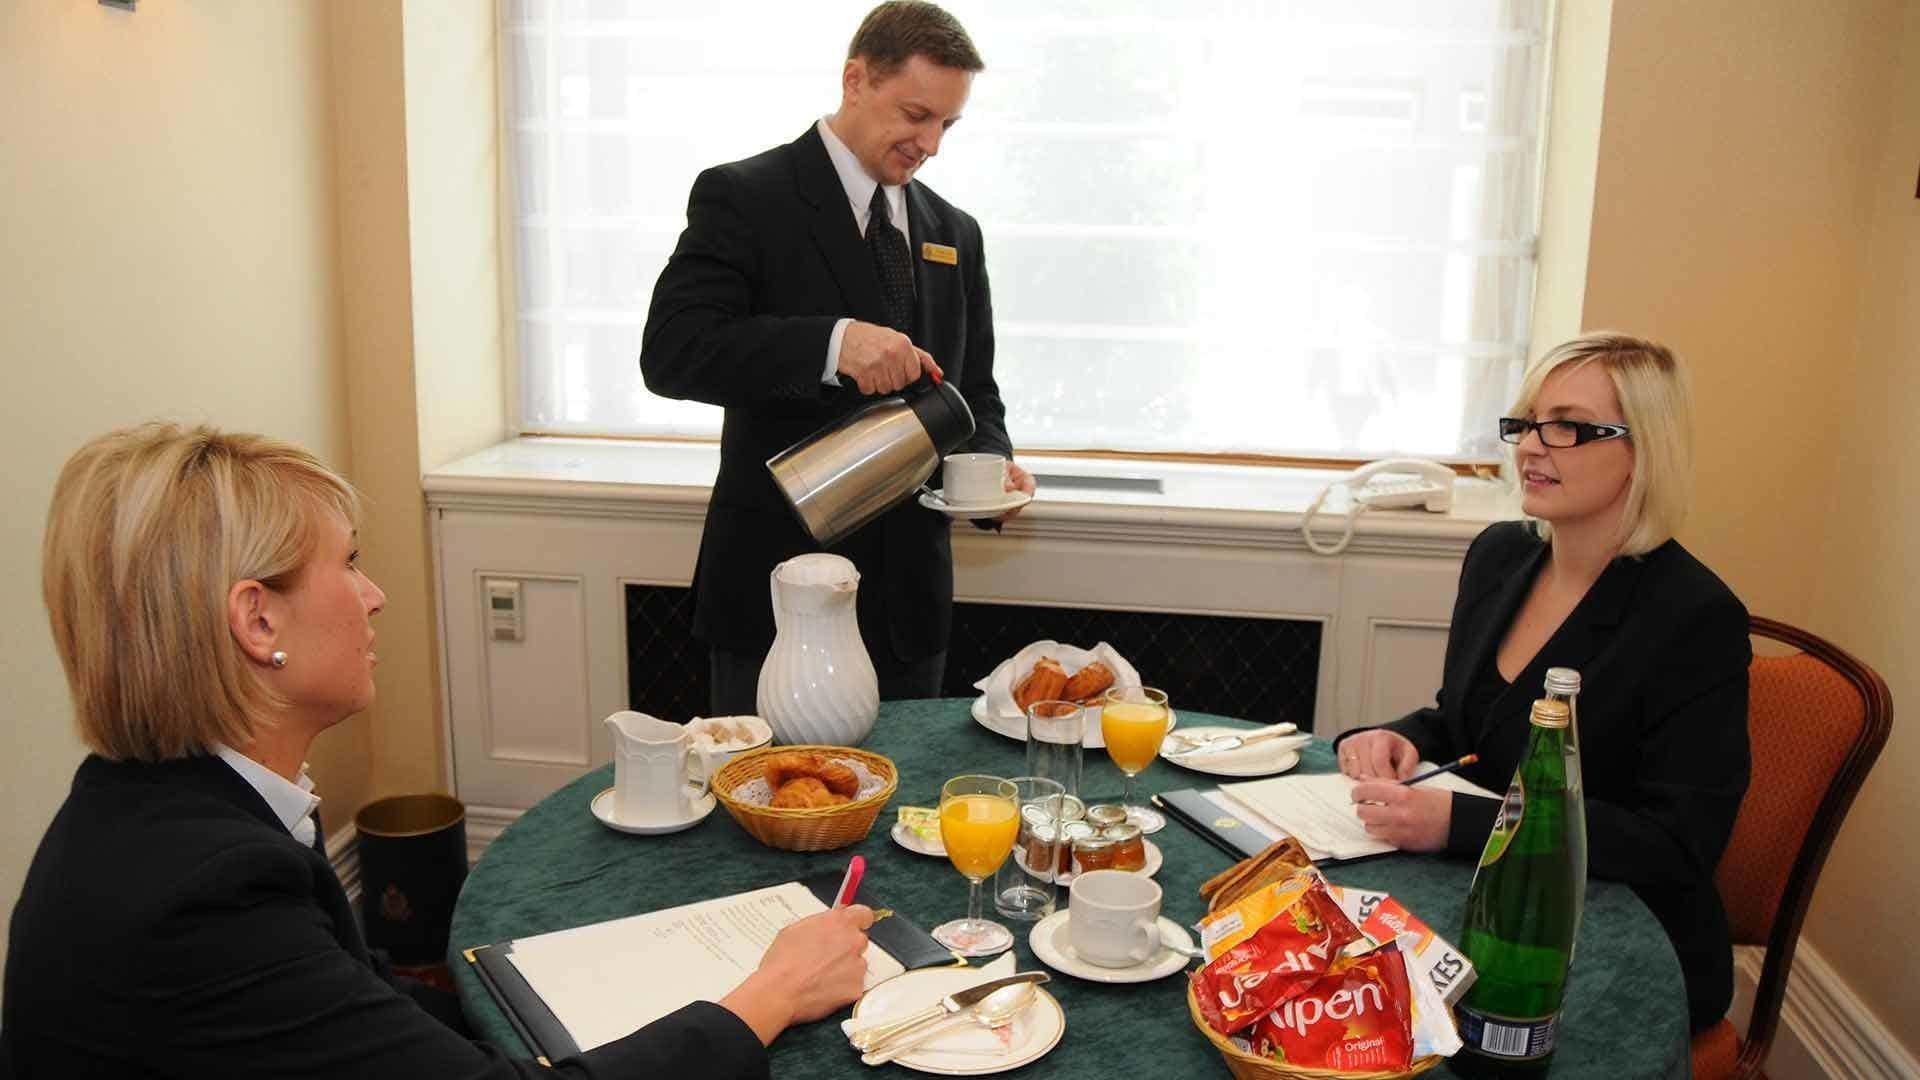 Barnes Room, The Army & Navy Club